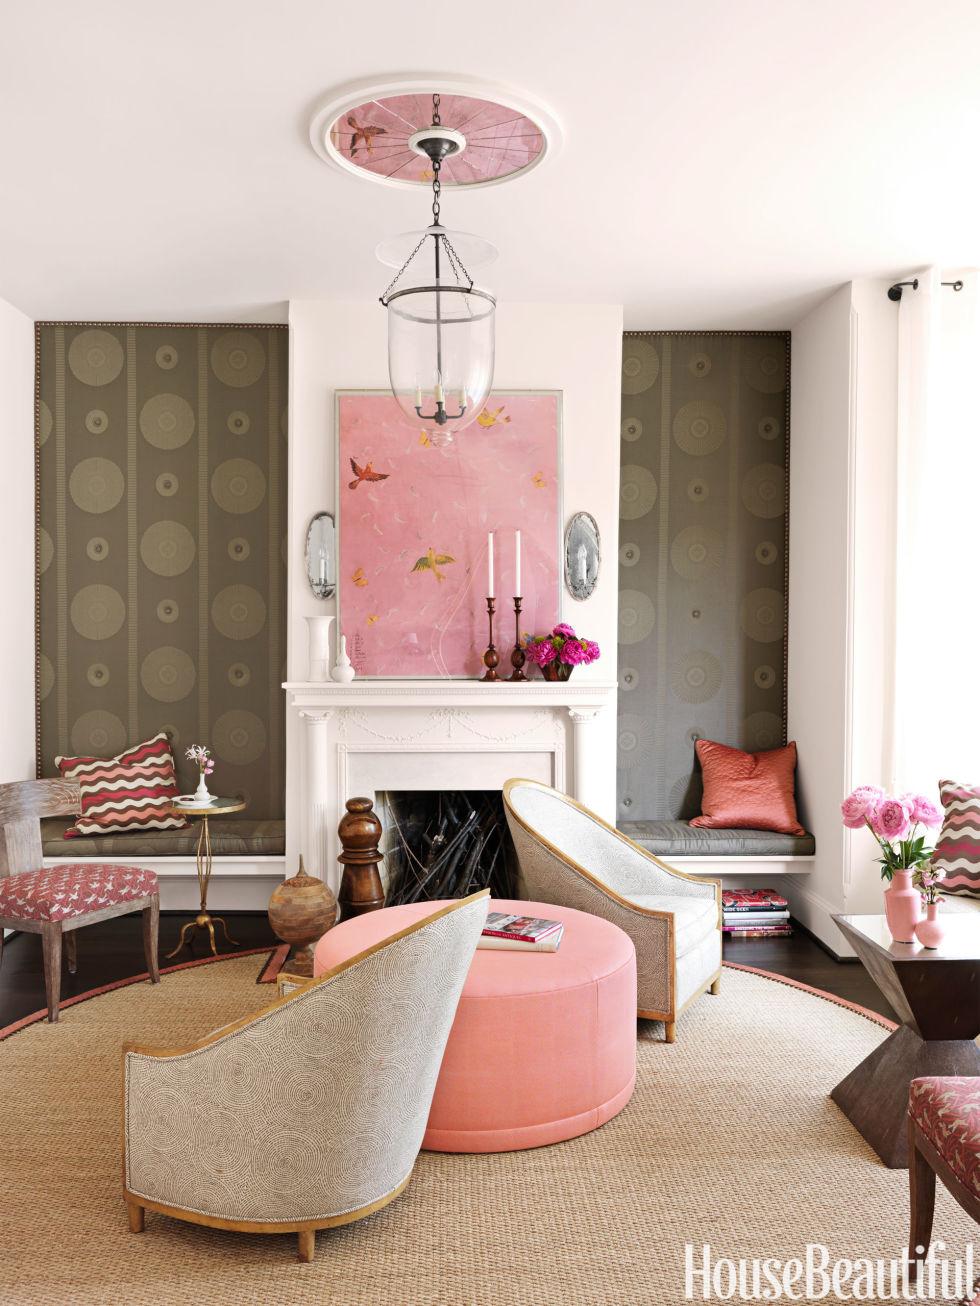 olor Decorating Ideas - olorful Interior Design - ^